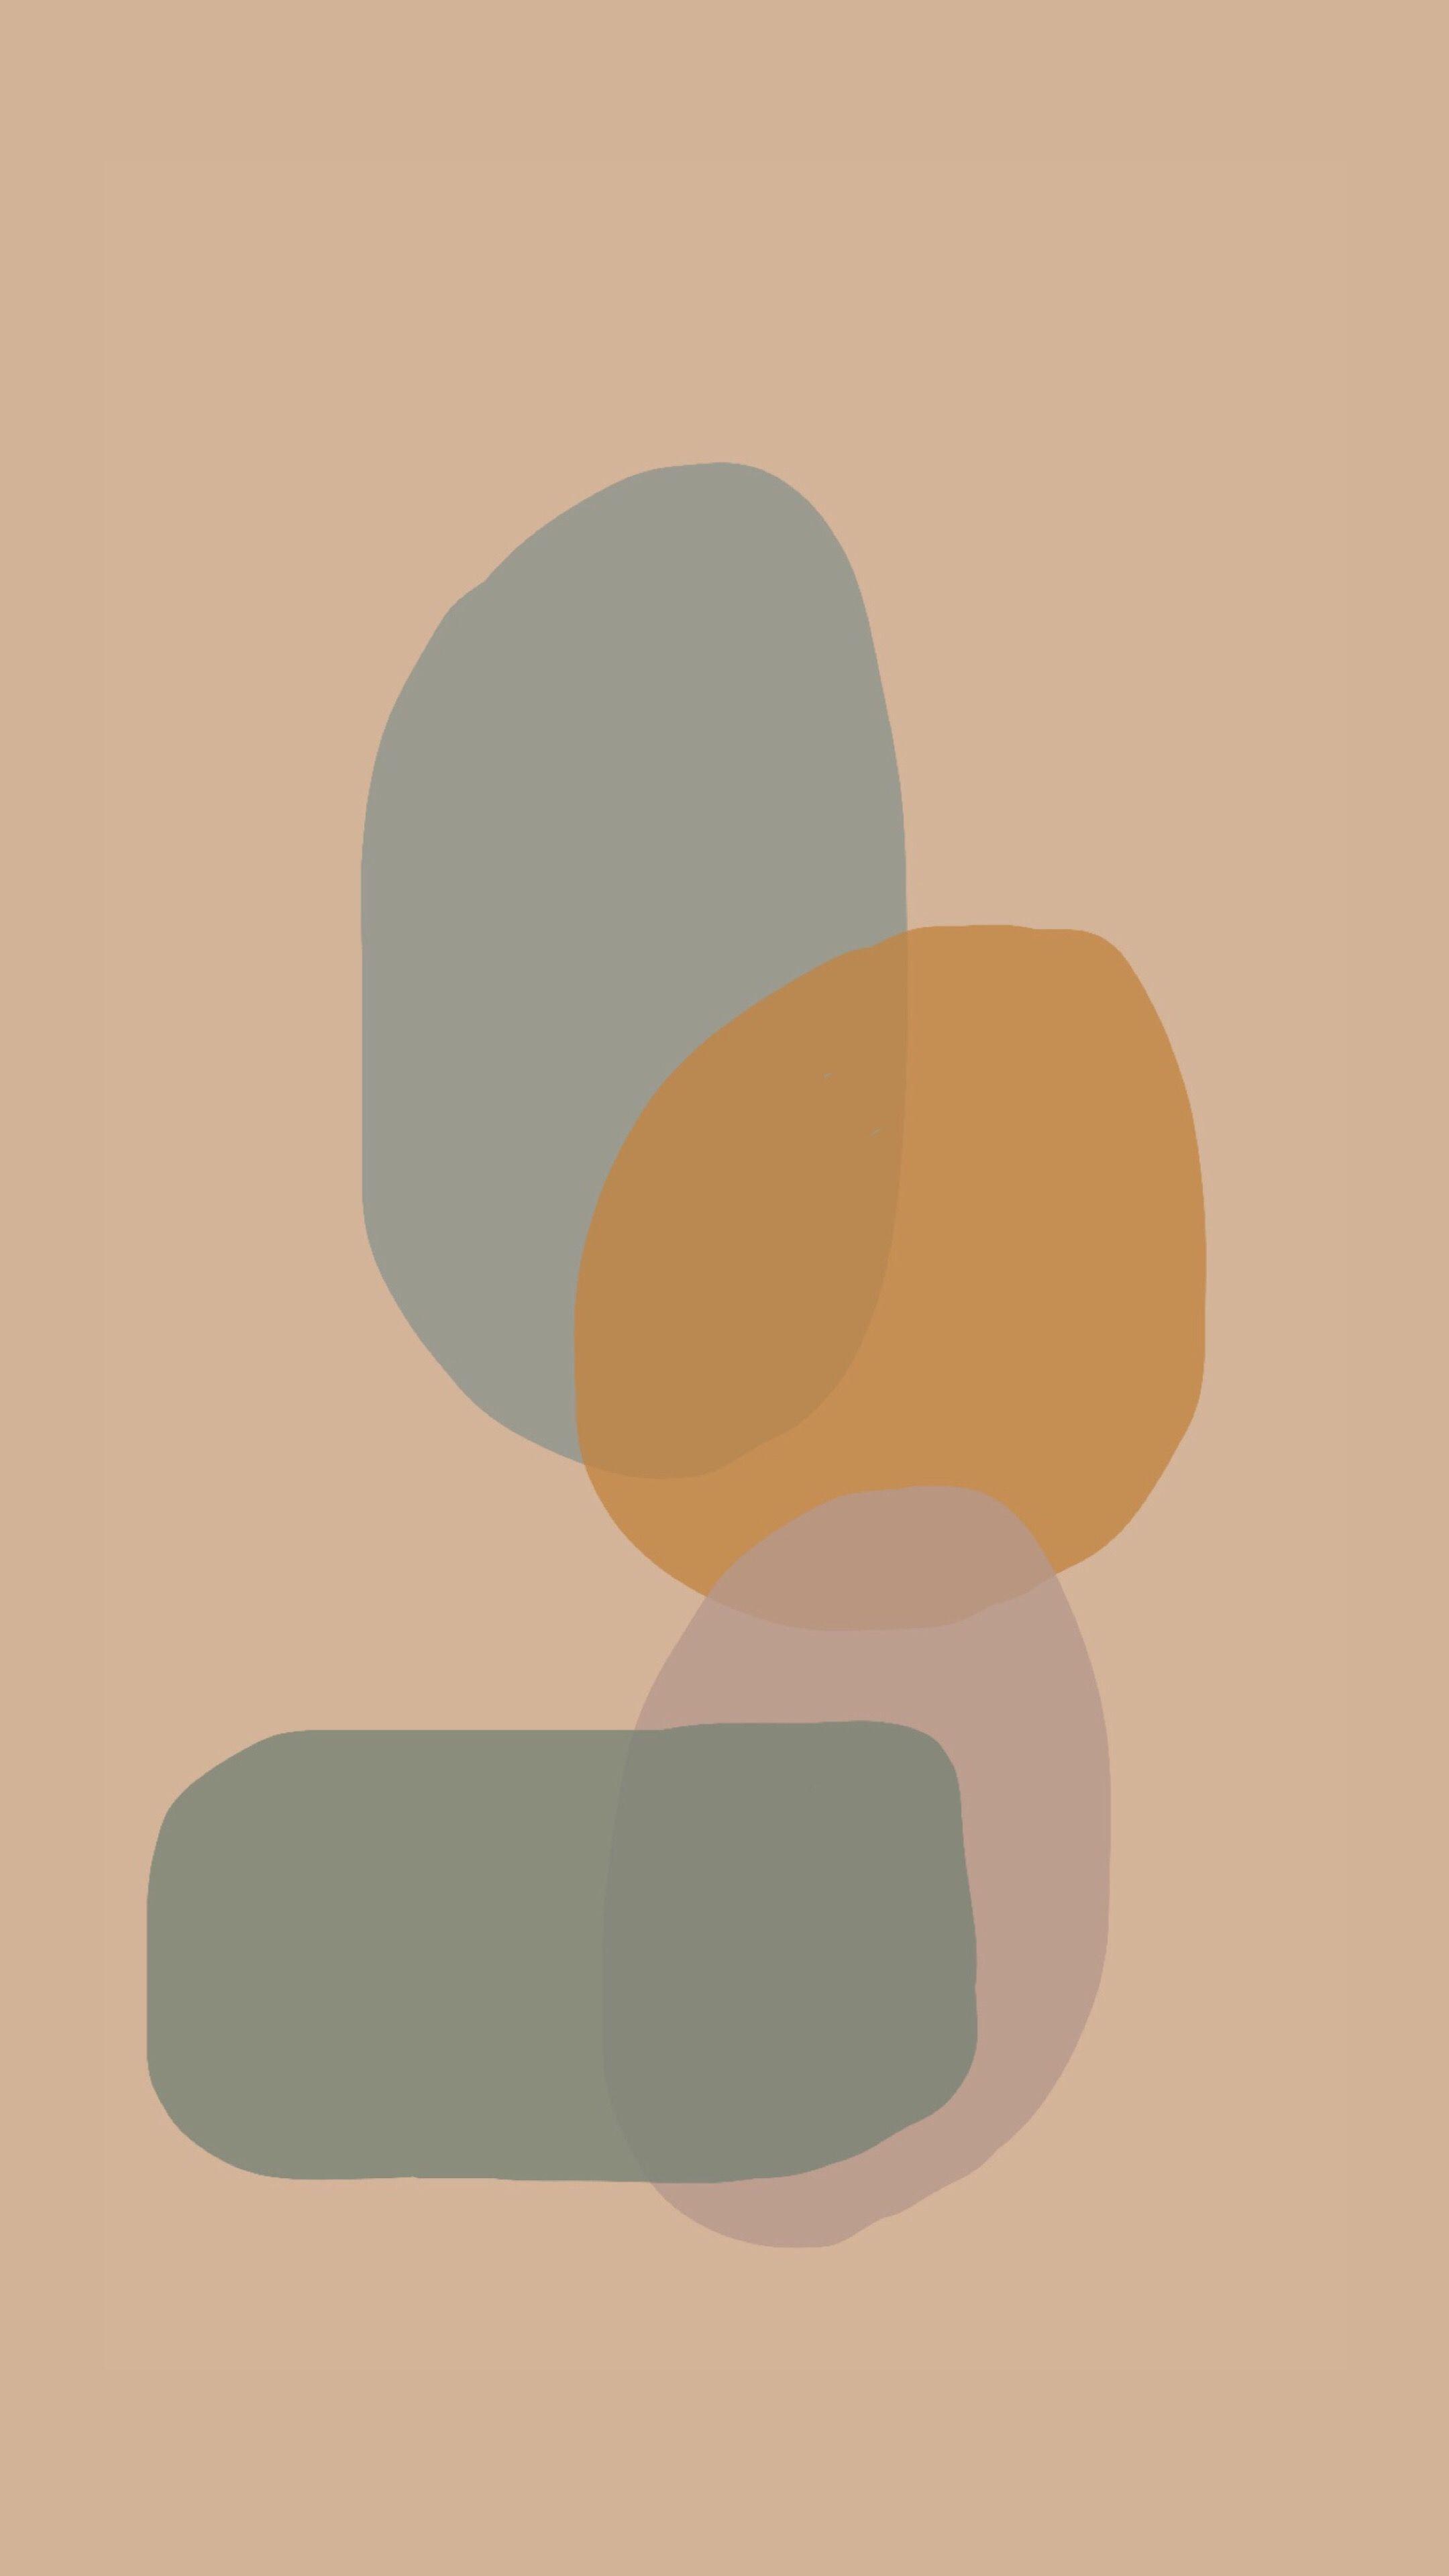 minimalist art in 2020 | Aesthetic iphone wallpaper ...